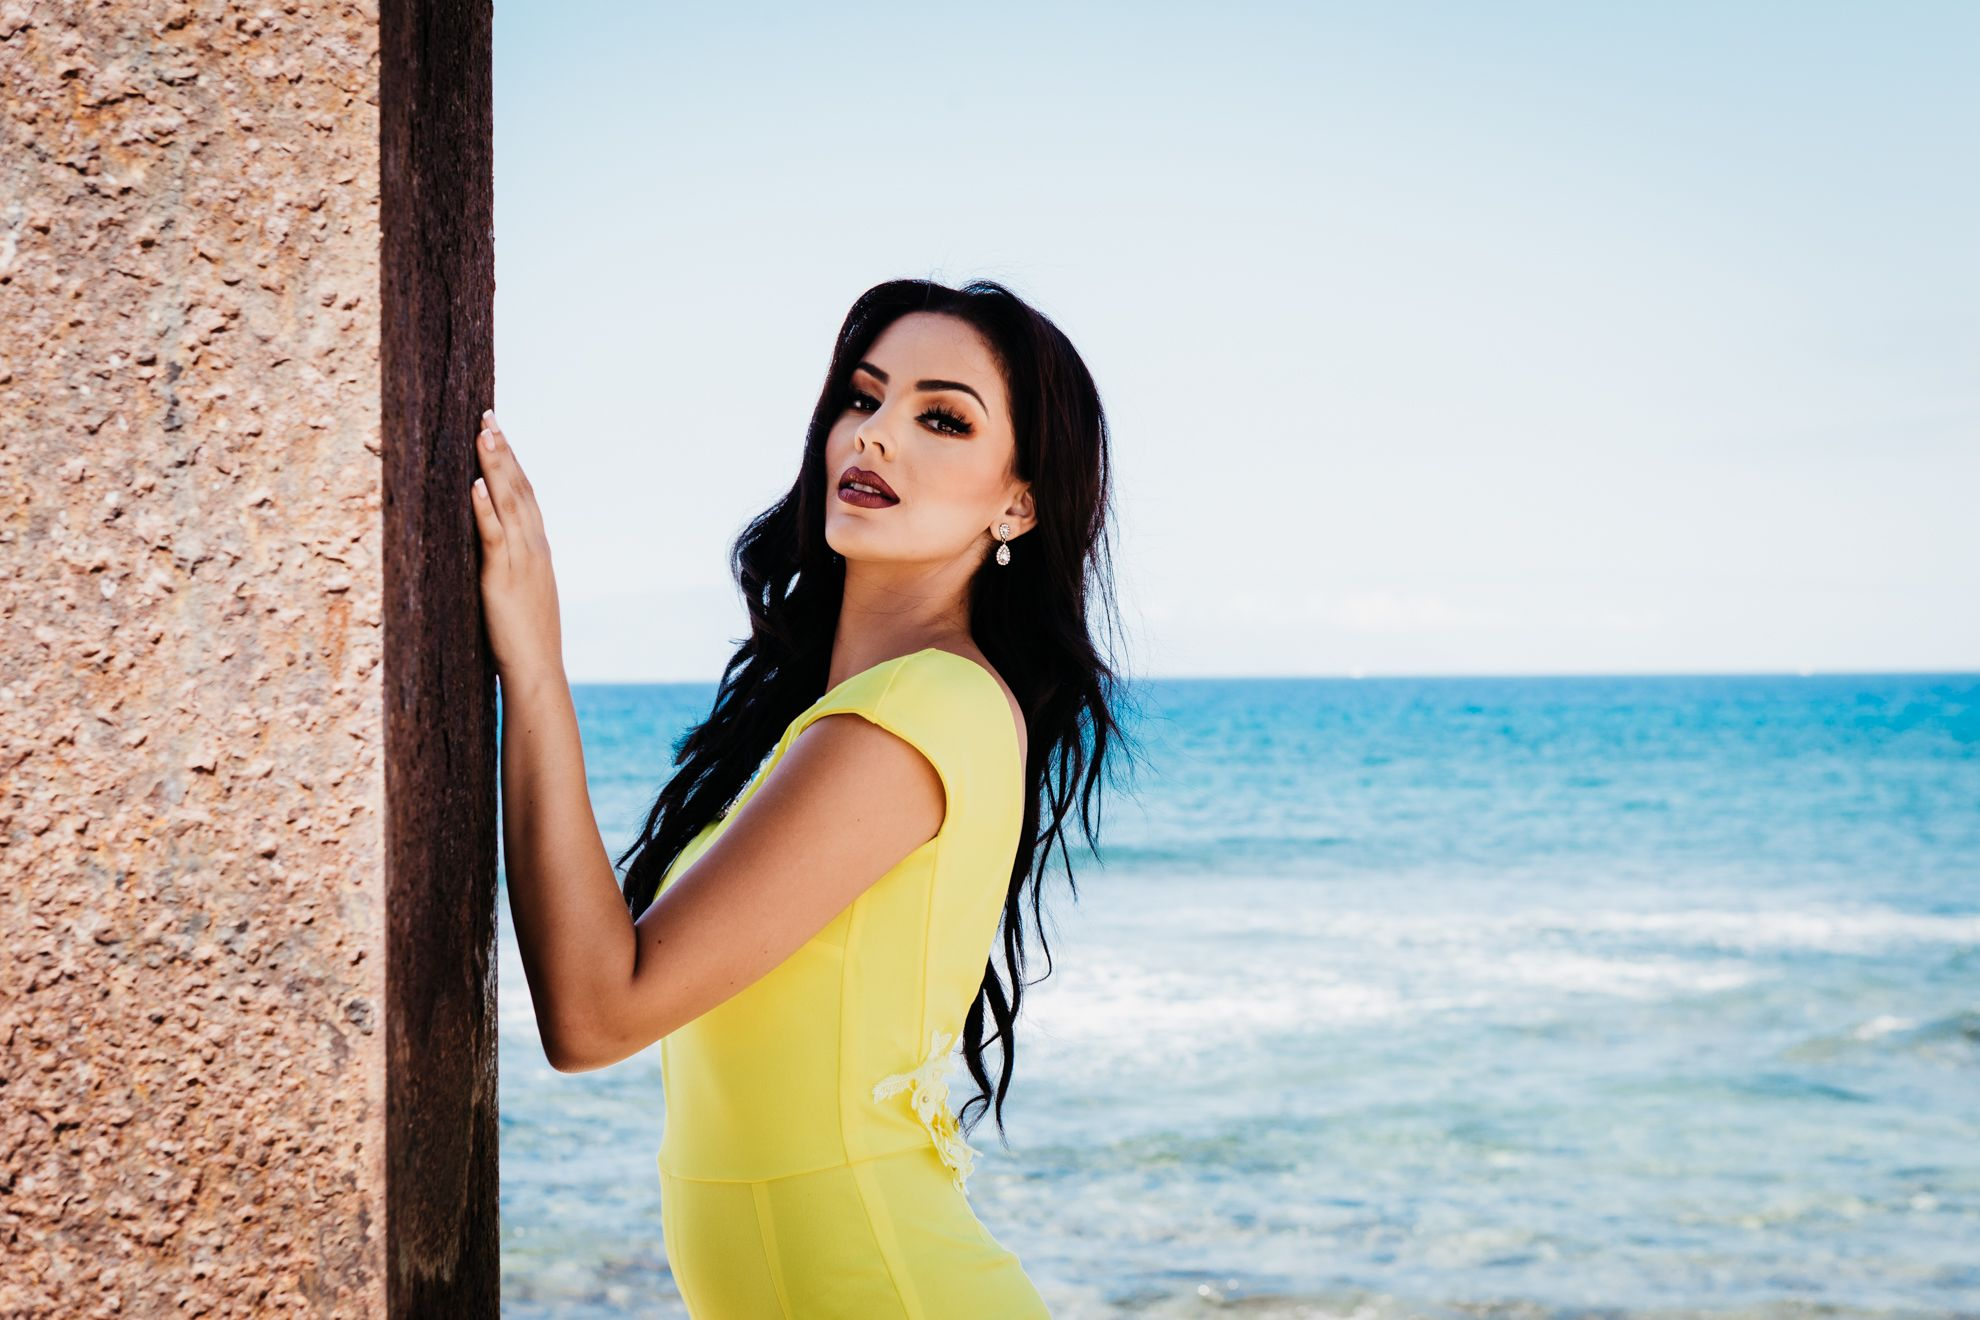 Yanira Morales, candidata a representar a España en Miss Universo